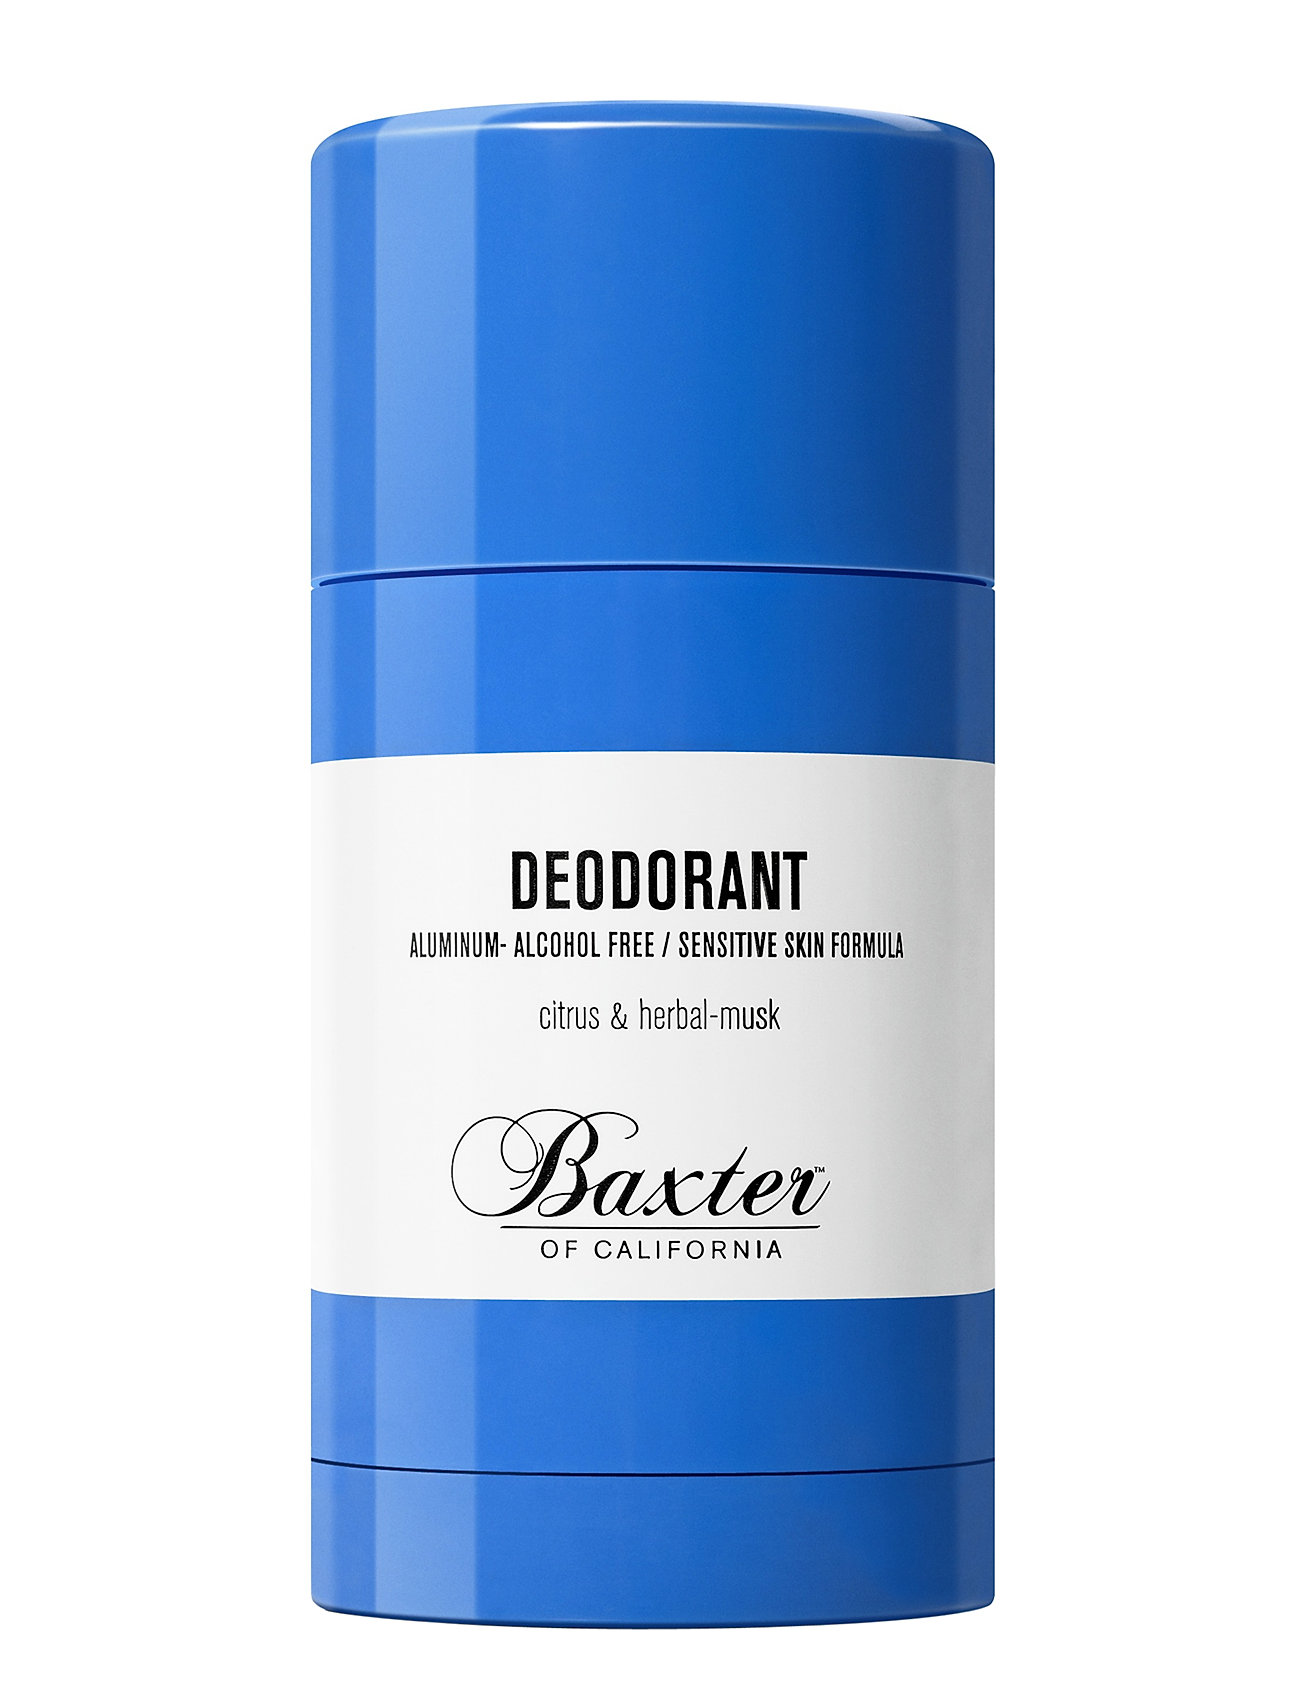 Image of Deodorant 75g Beauty MEN Deodorants Sticks Nude Baxter Of California (3298483725)